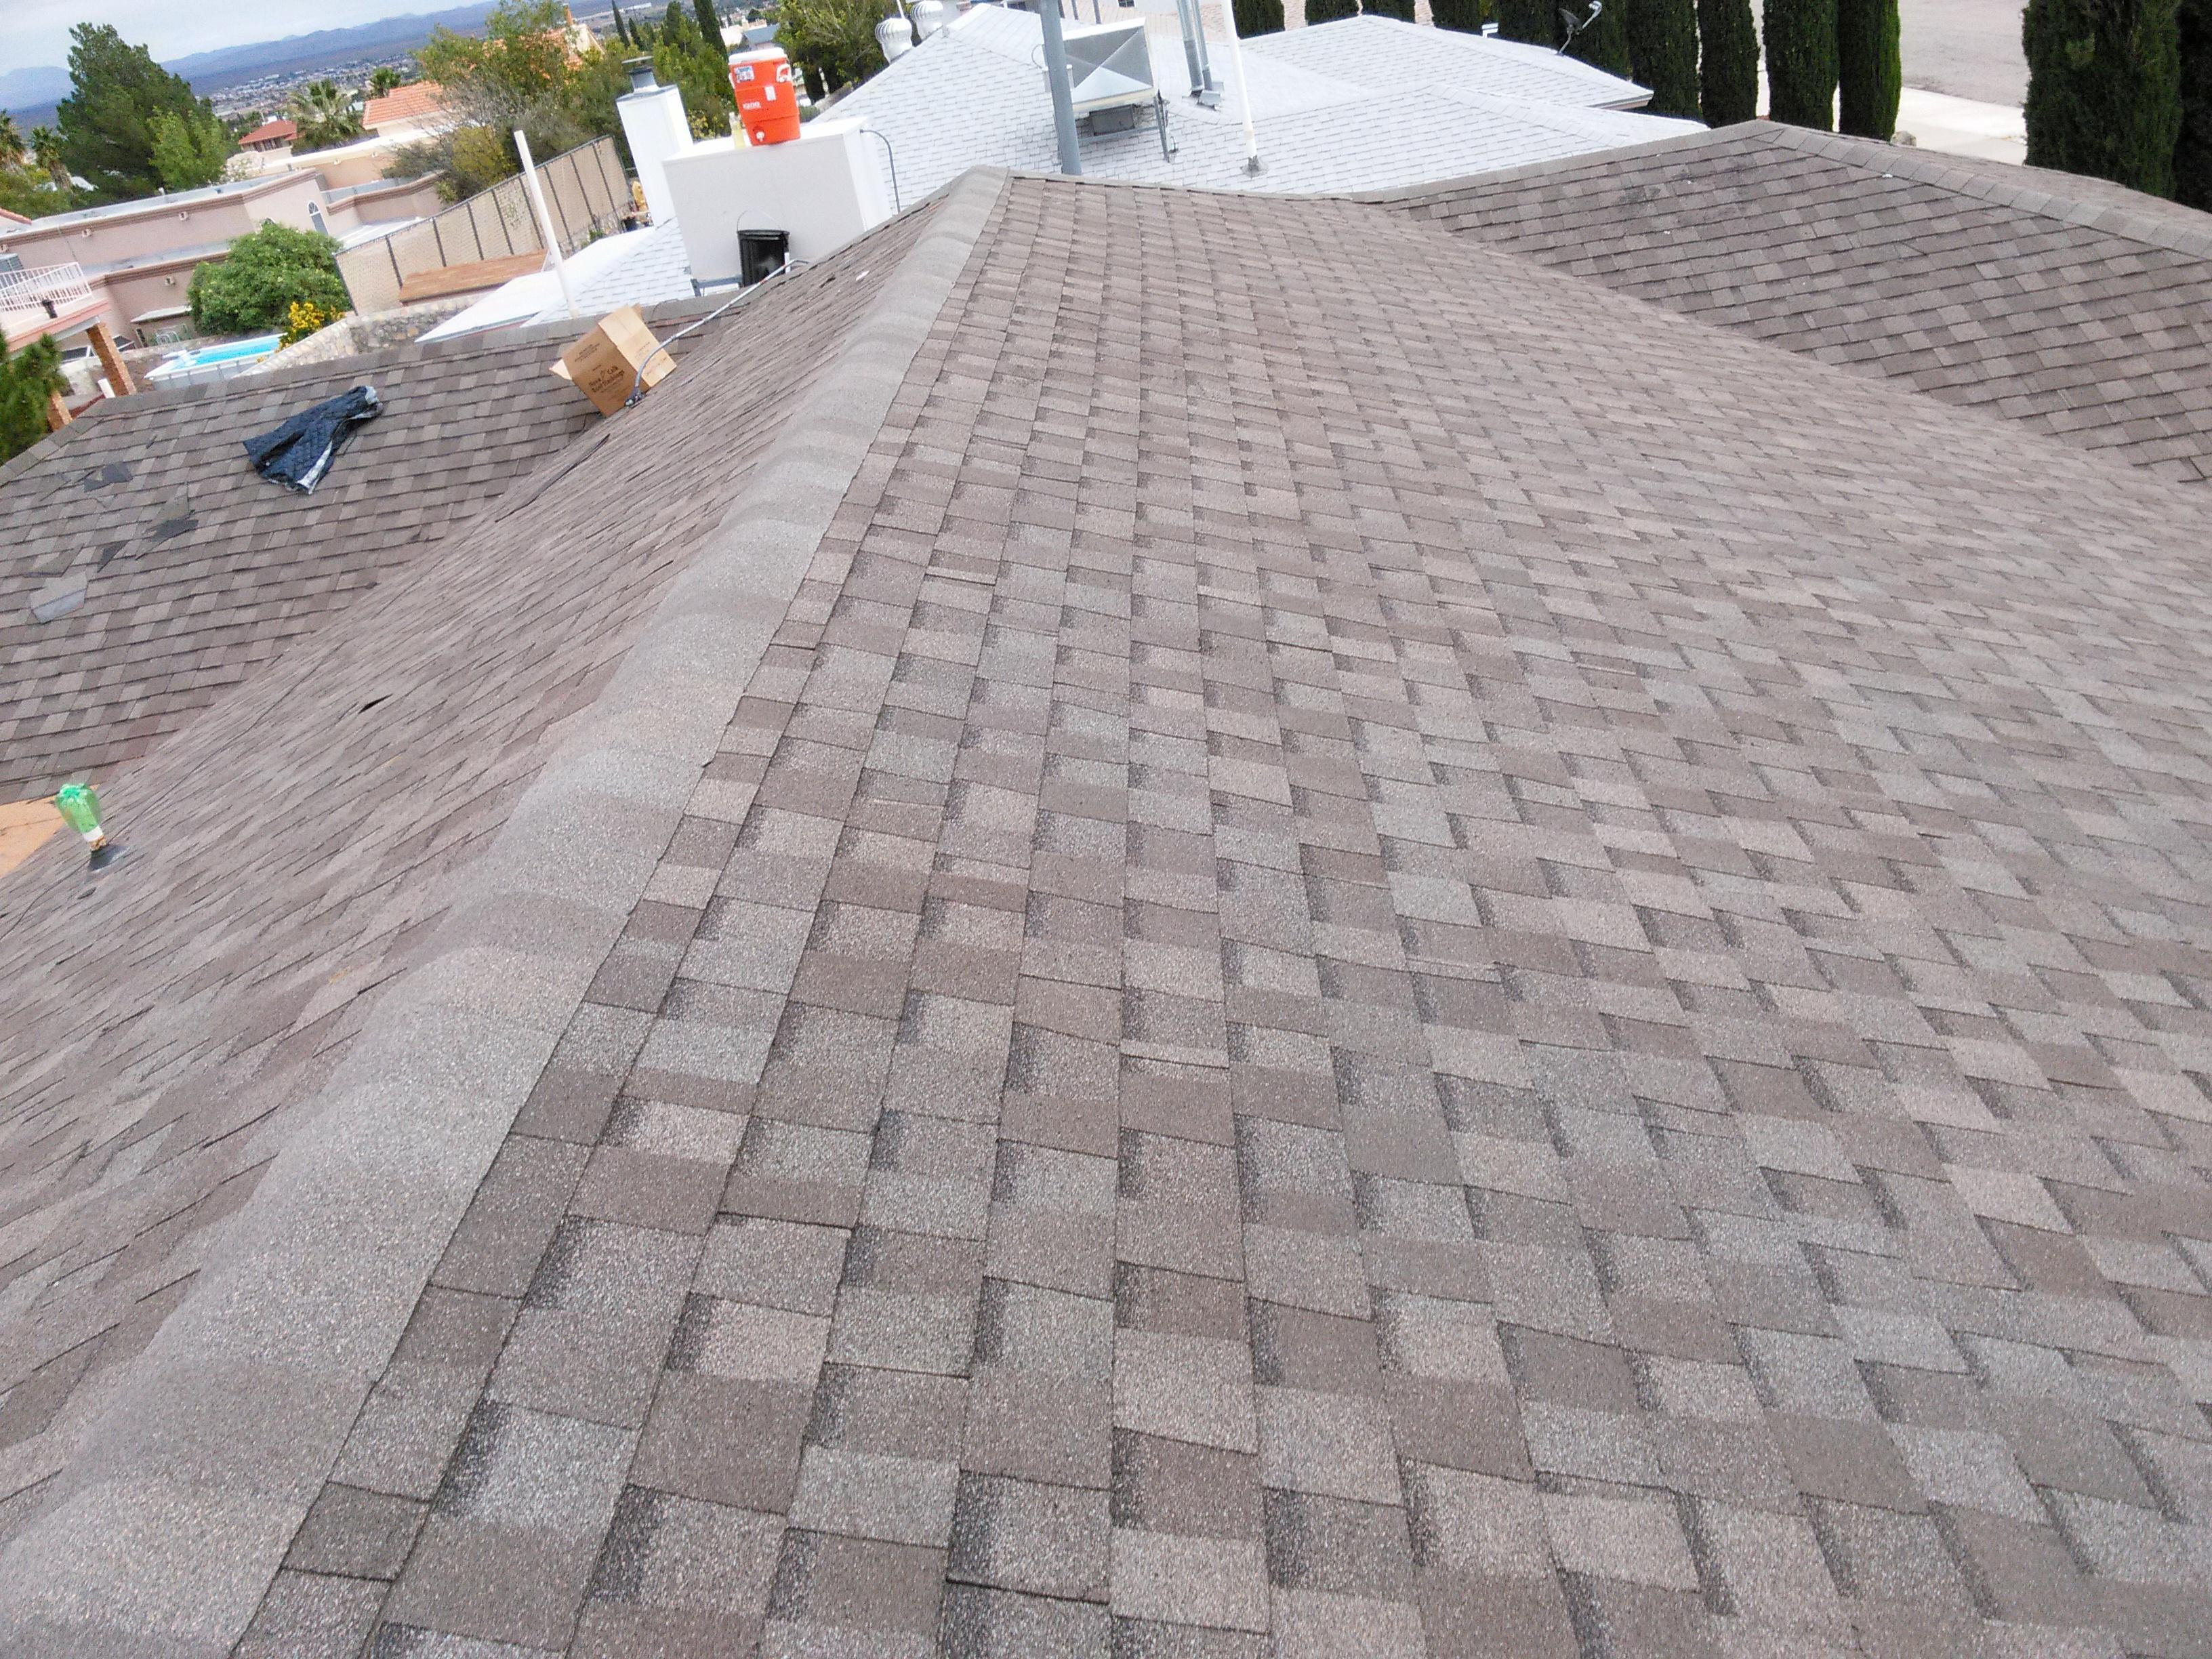 Longhorn Roofing & Remodeling